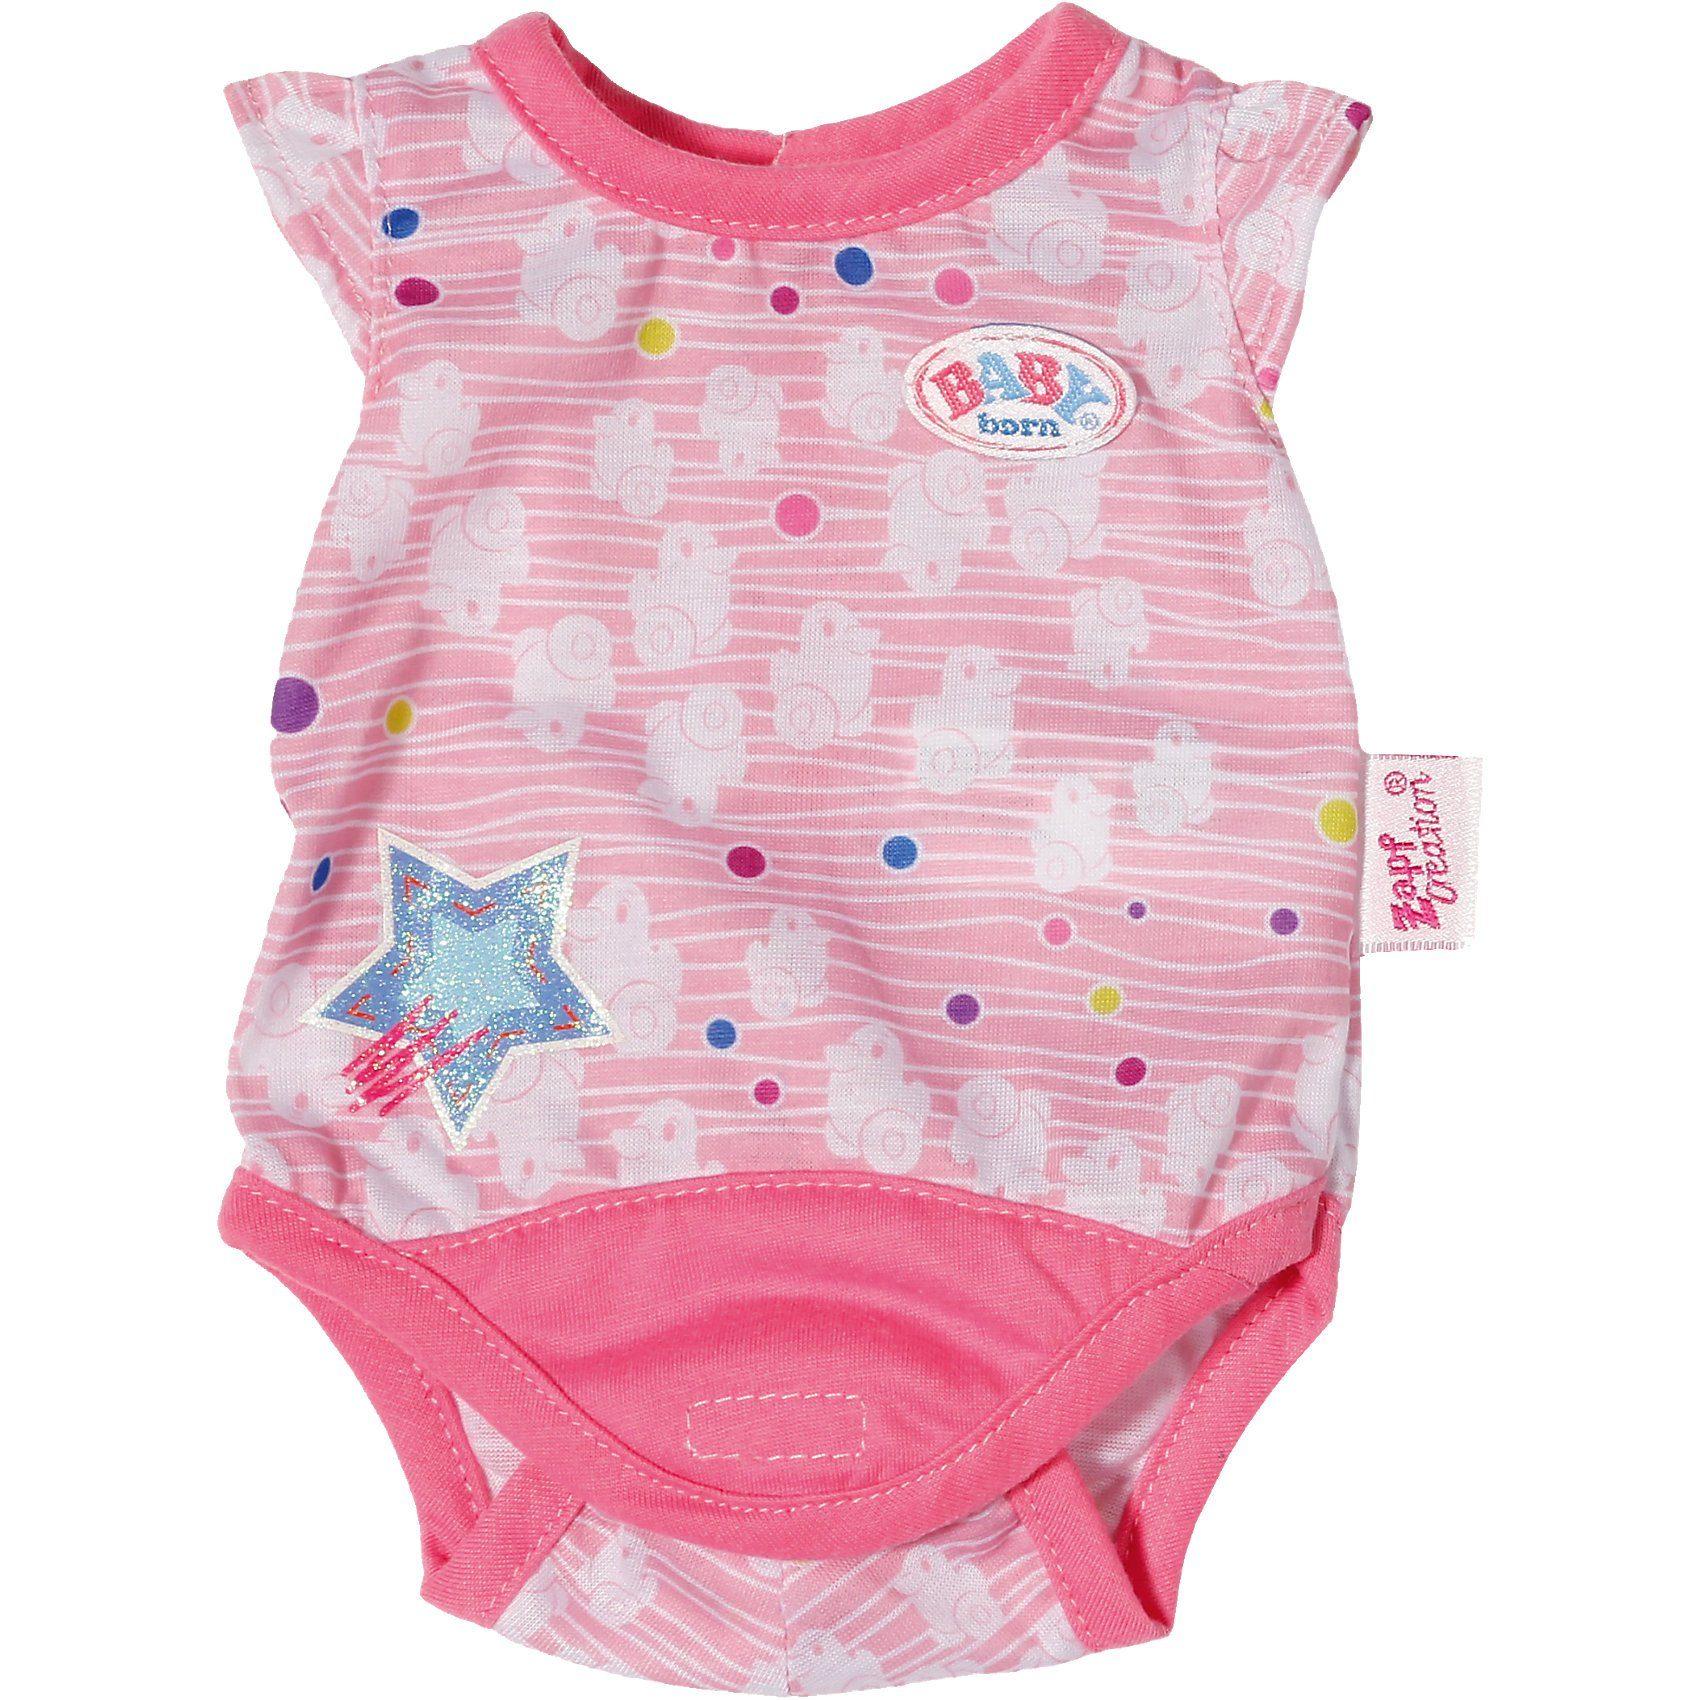 Zapf Creation BABY born® Puppenkleidung Body Kollektion rosa, 43 cm